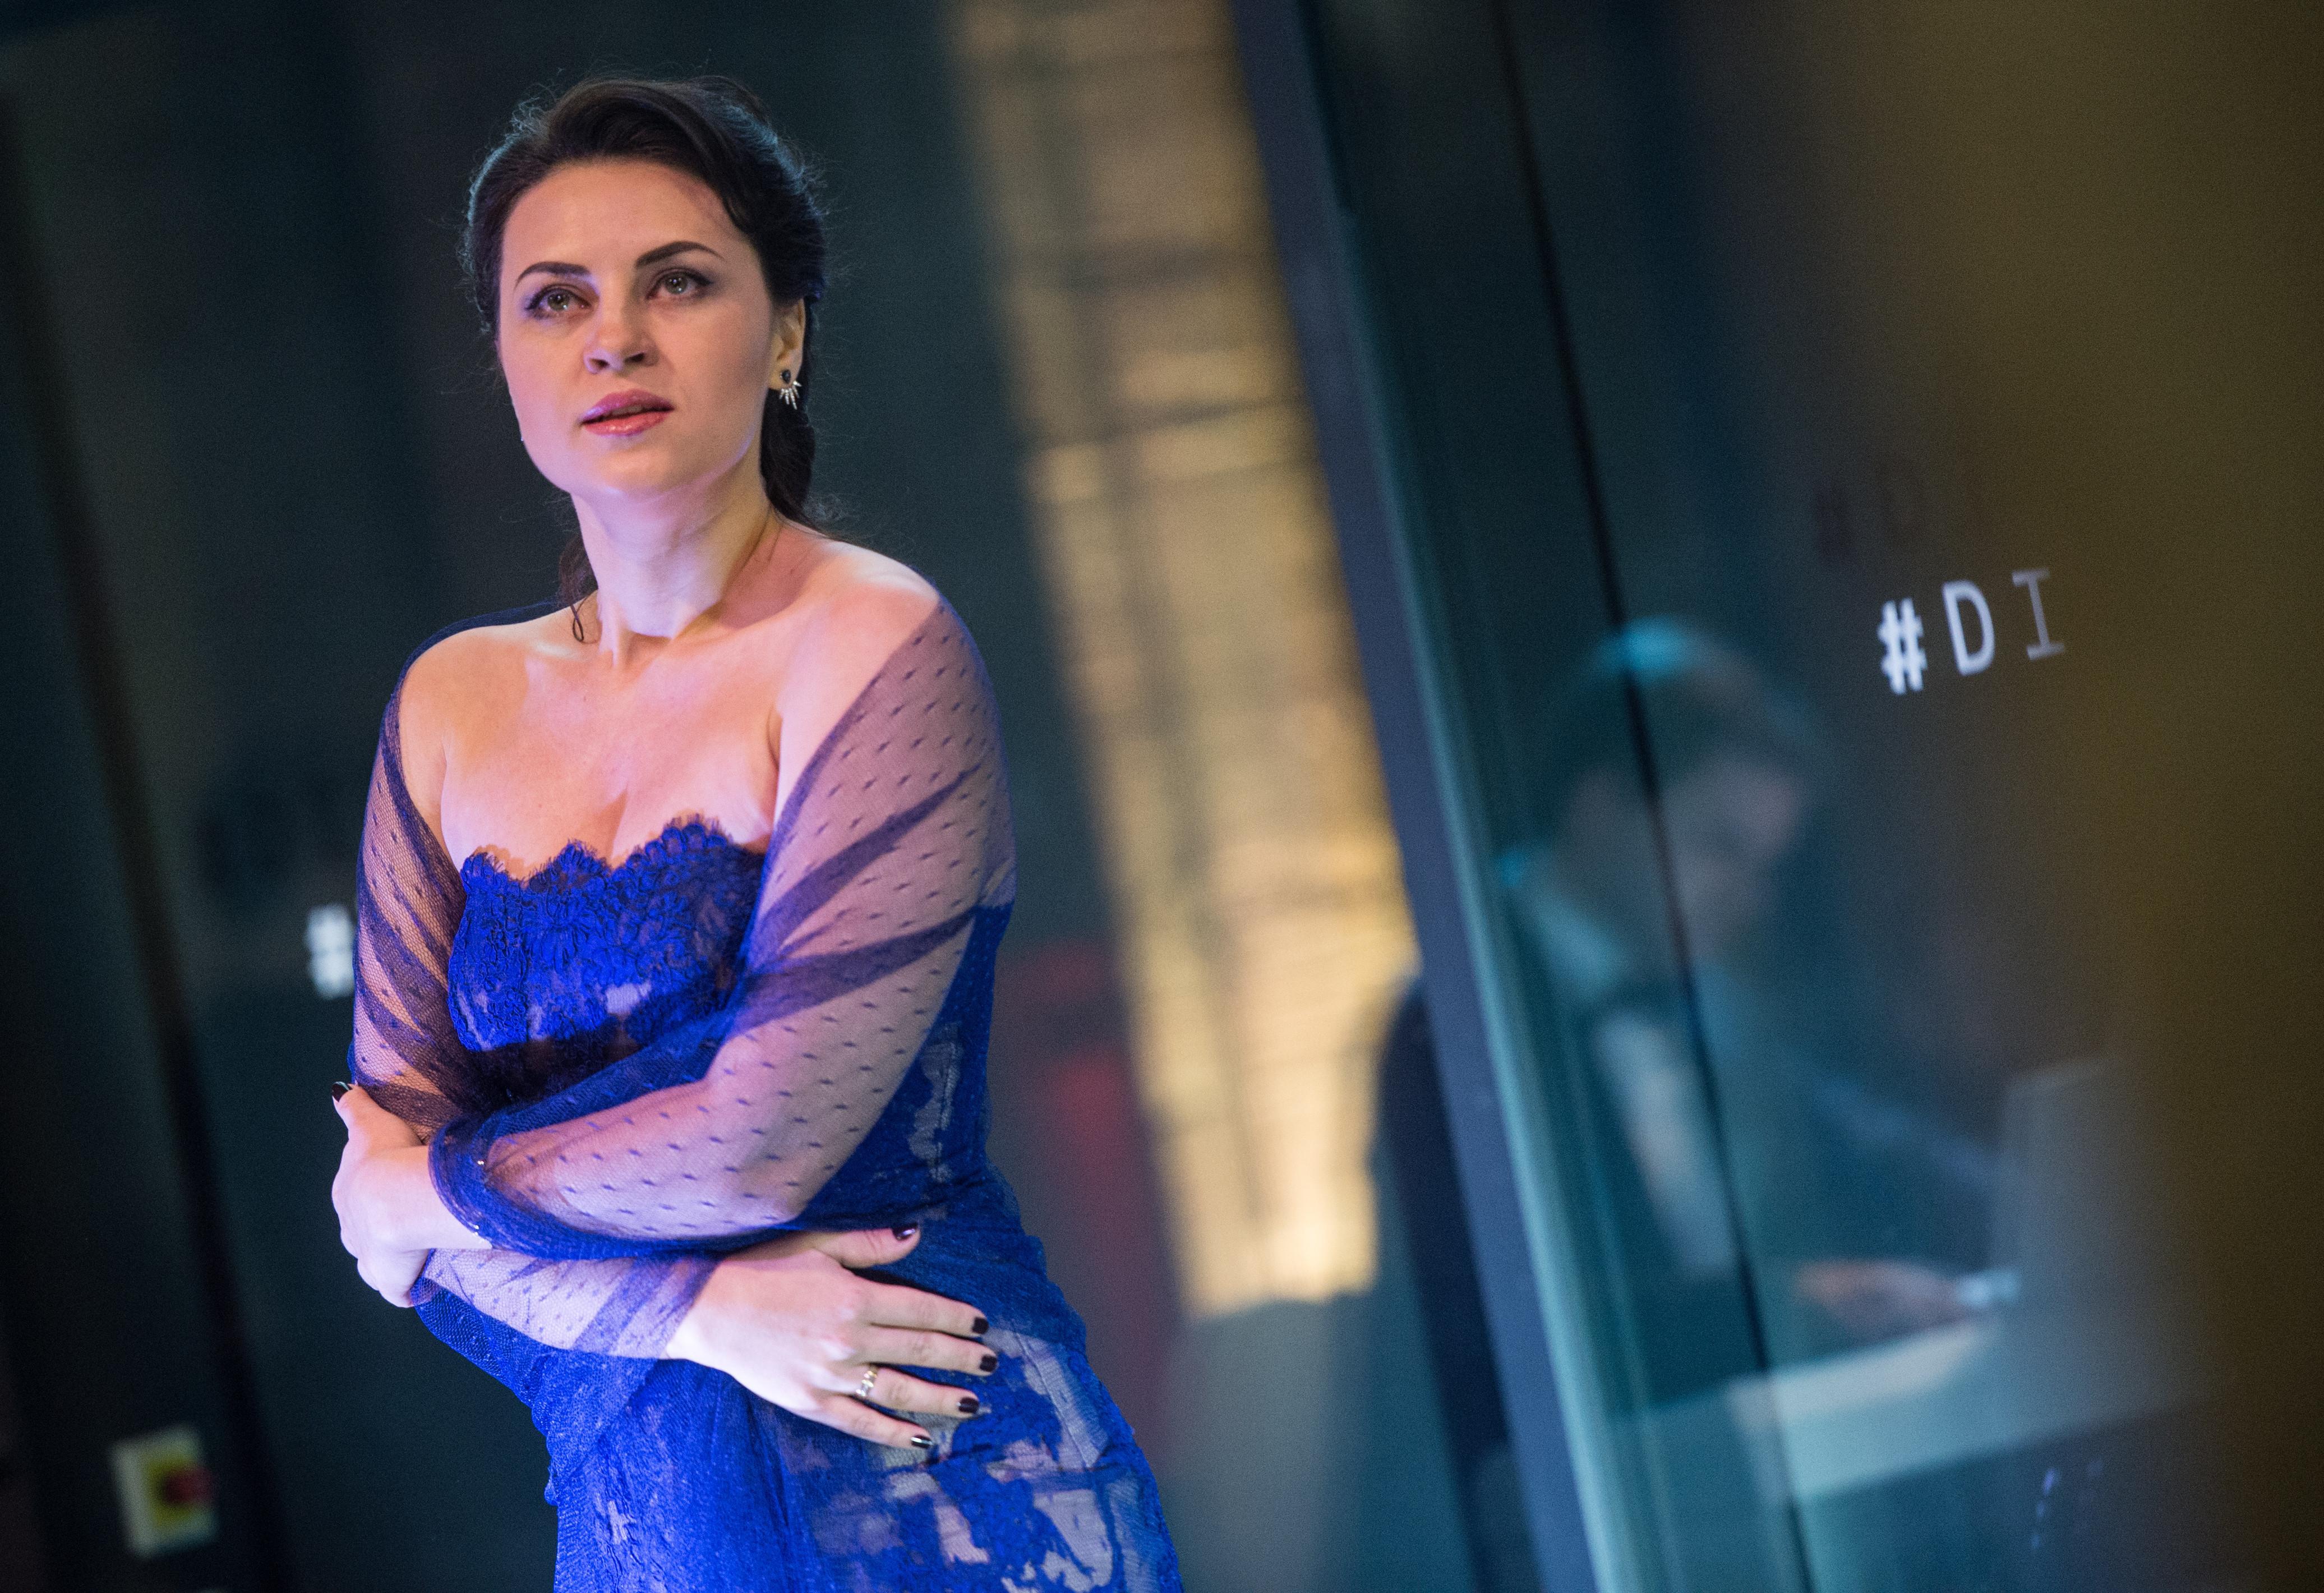 <p>Венера Гимадиева. Фото: &copy;РИА Новости/Евгений Биятов</p>